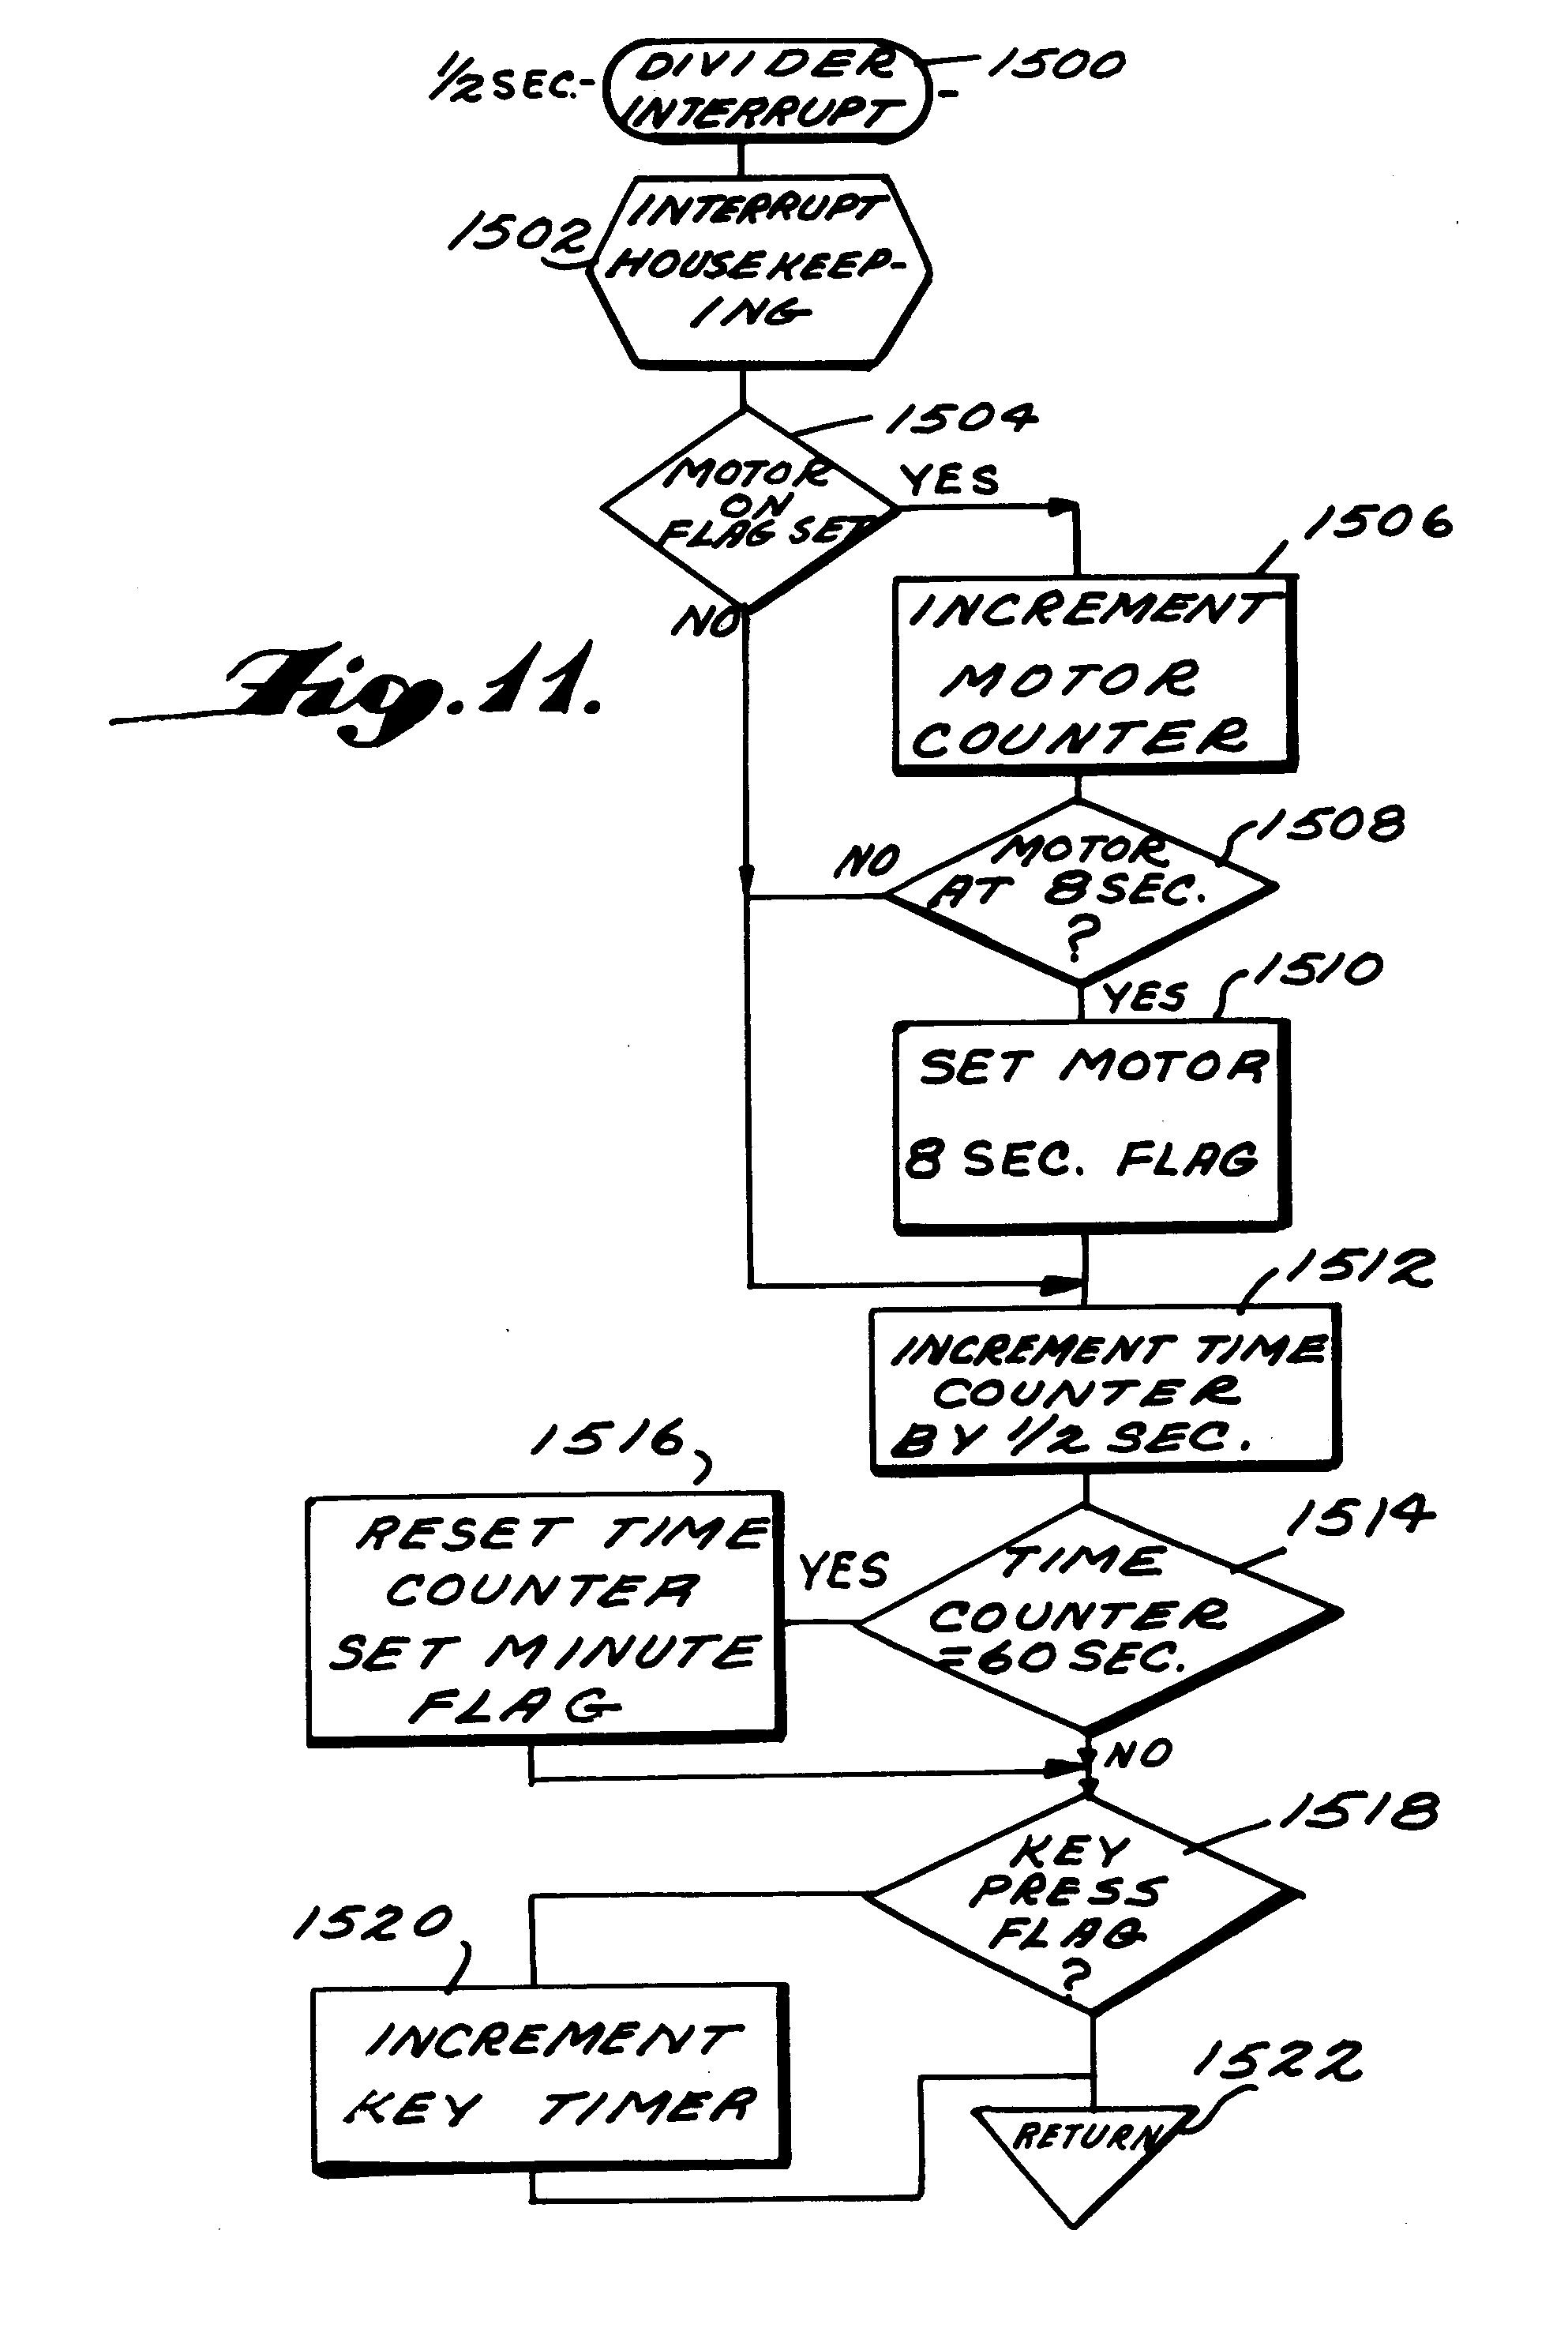 sprinkler timer wiring diagram two step dance orbit free engine image for user